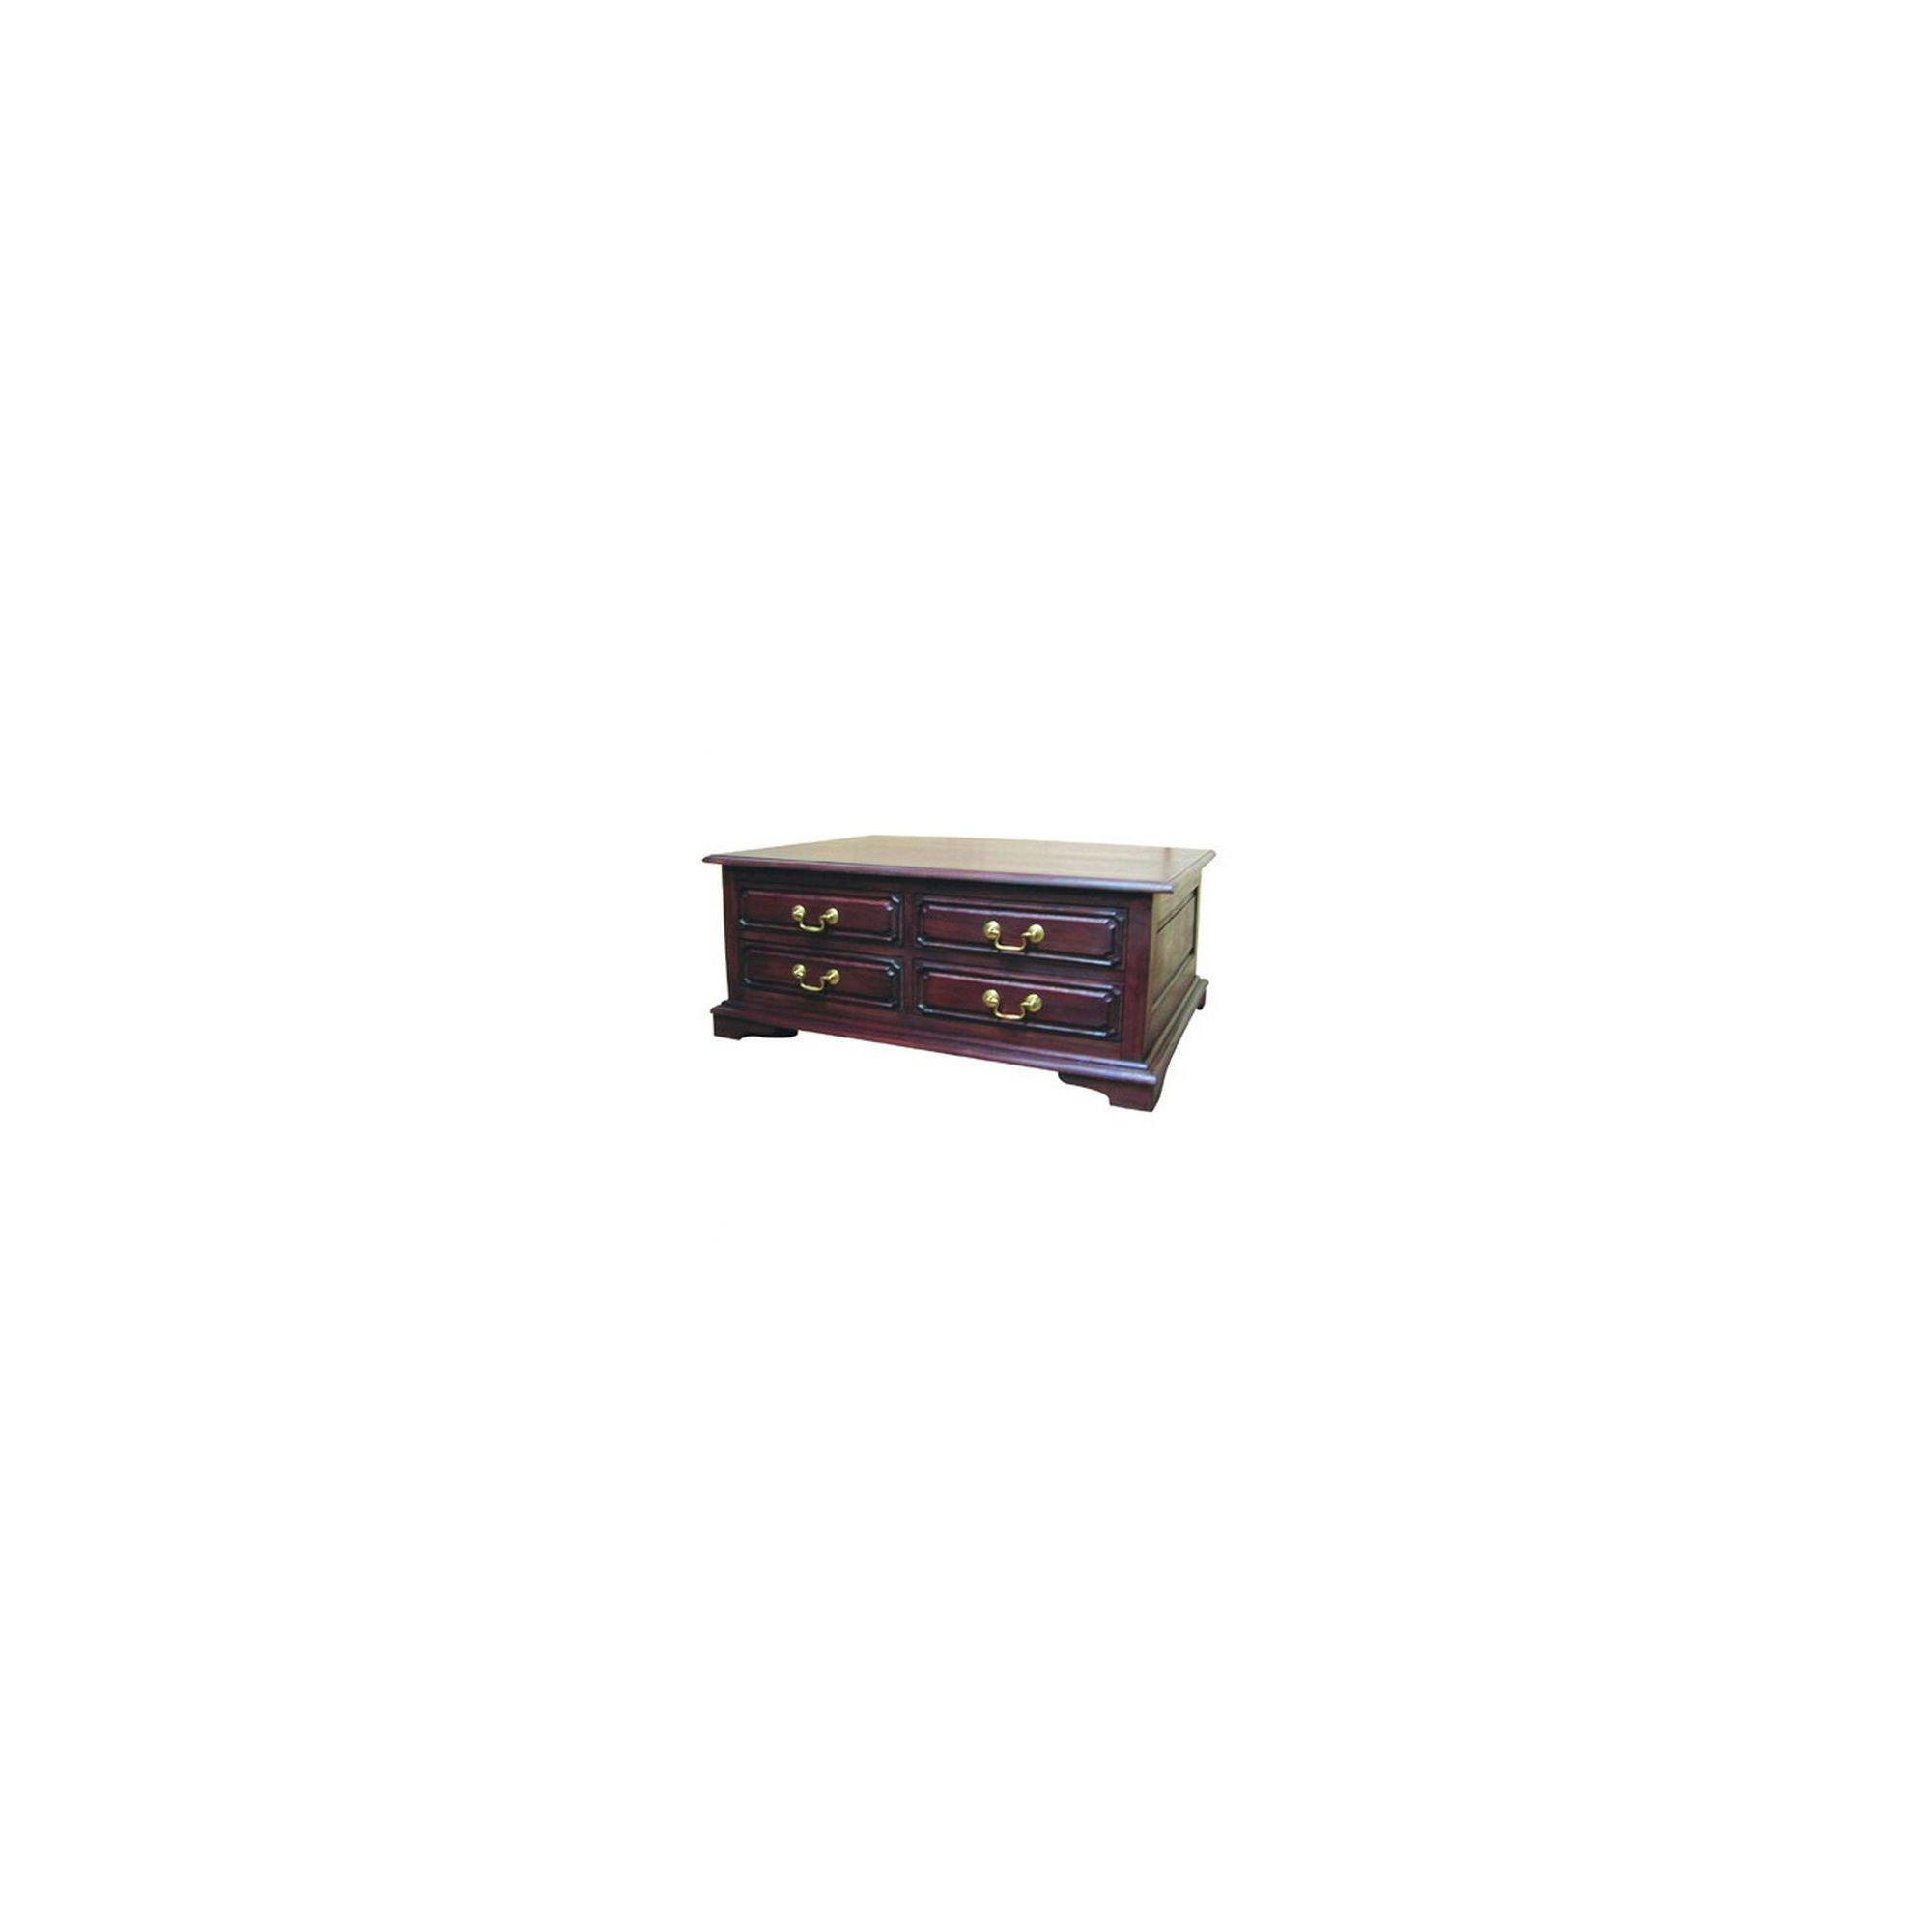 Lock stock and barrel Mahogany 8 Drawer Coffee Table in Mahogany at Tesco Direct